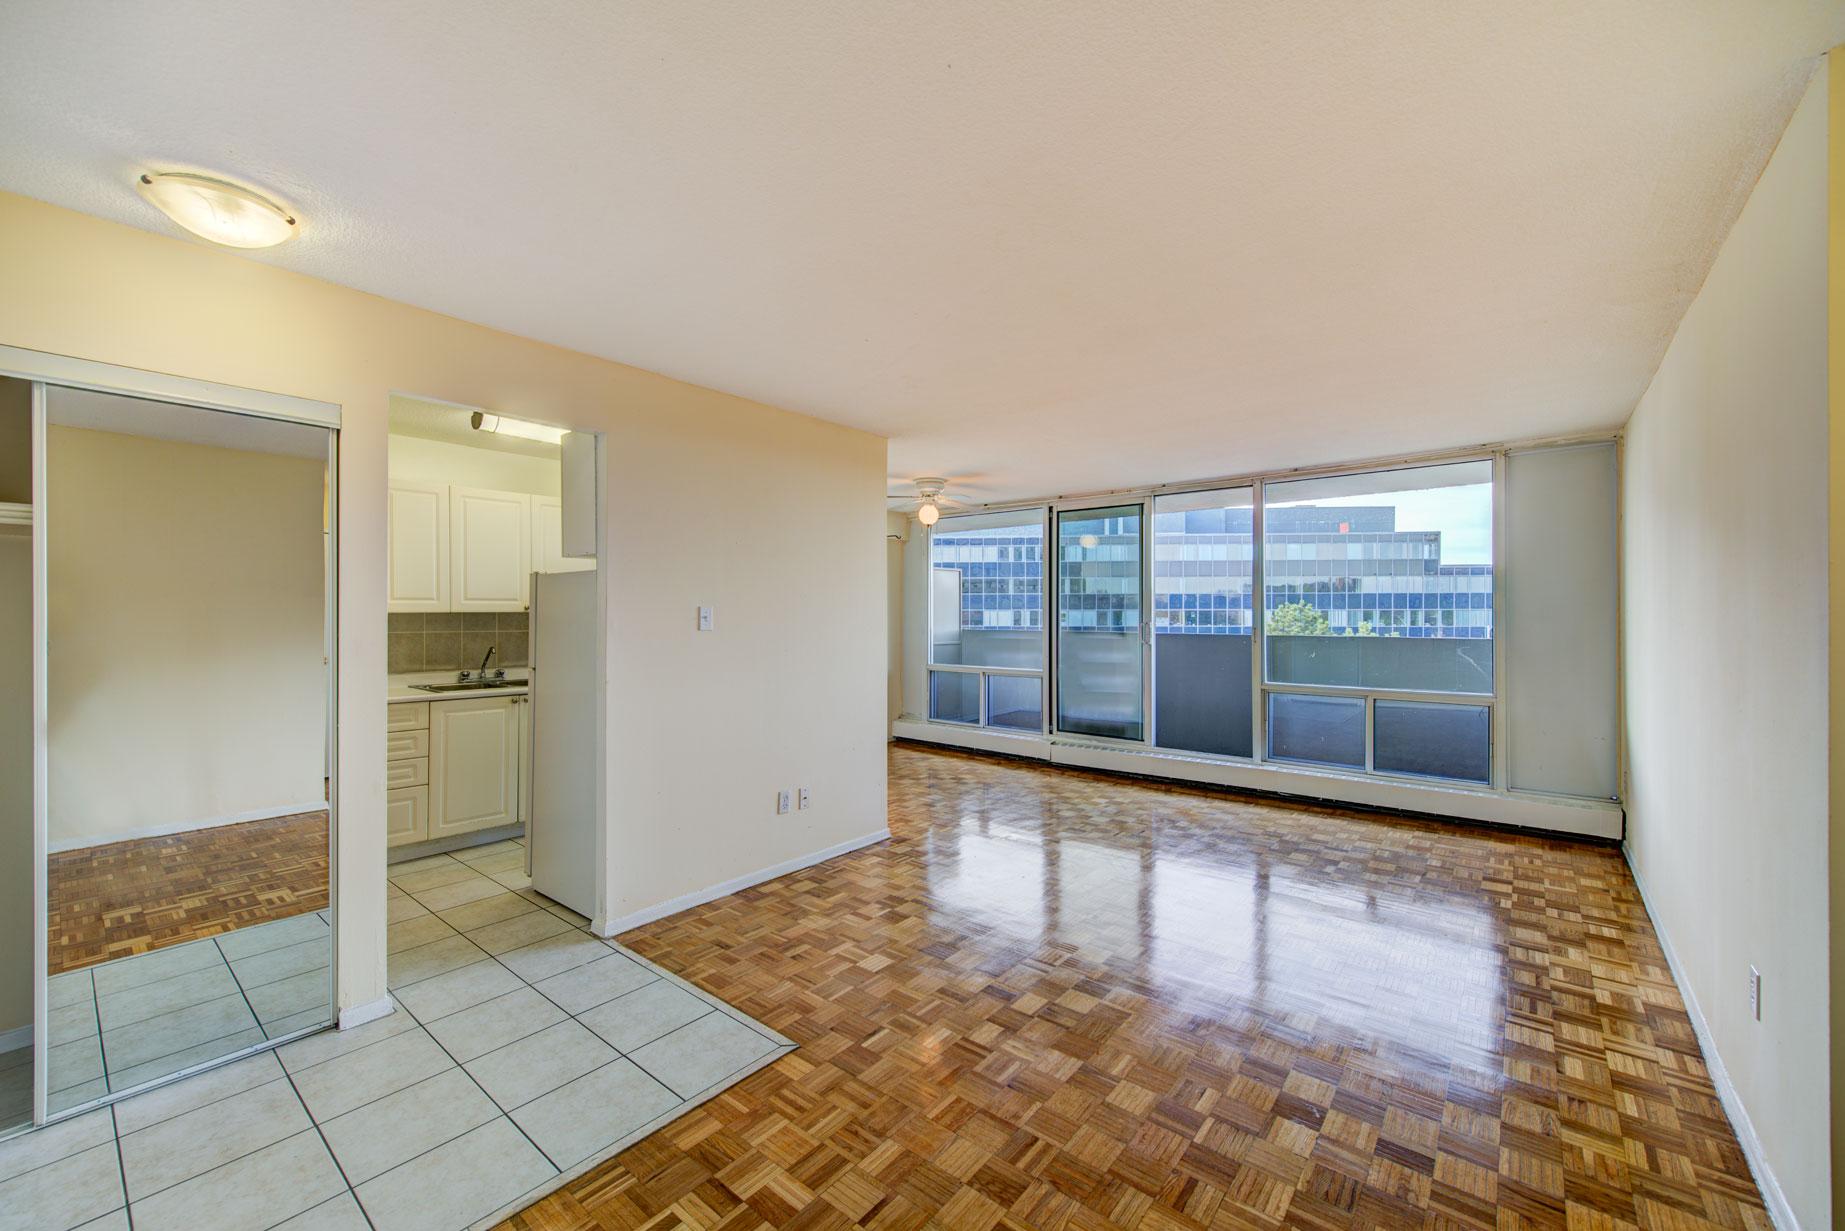 Agnes Apartments: Close to Square One   Mississauga ...